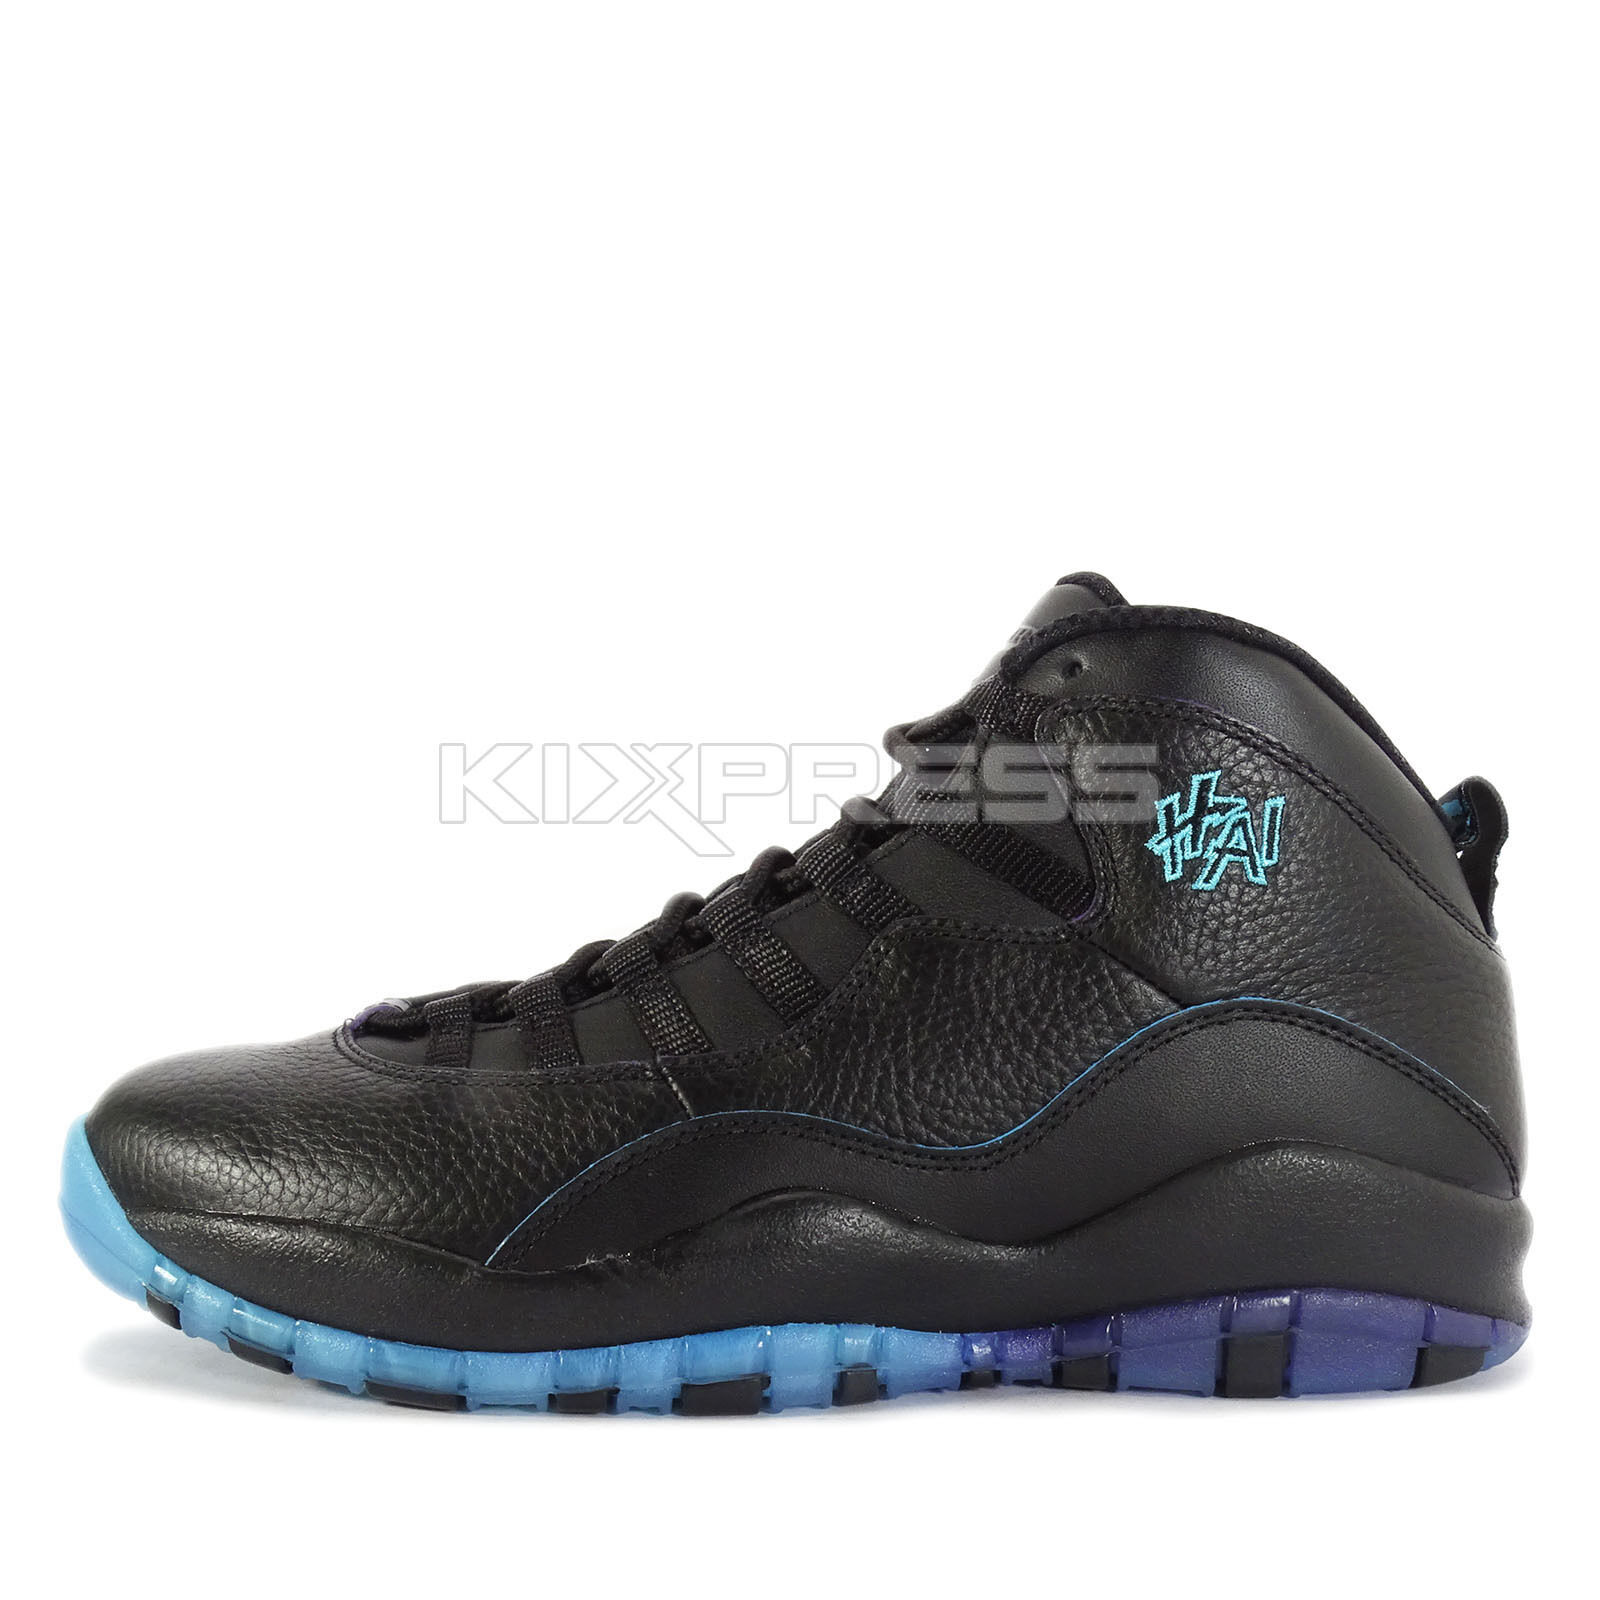 Nike air jordan 10 retro - basketball - shanghai asien schwarz / gamma - blau